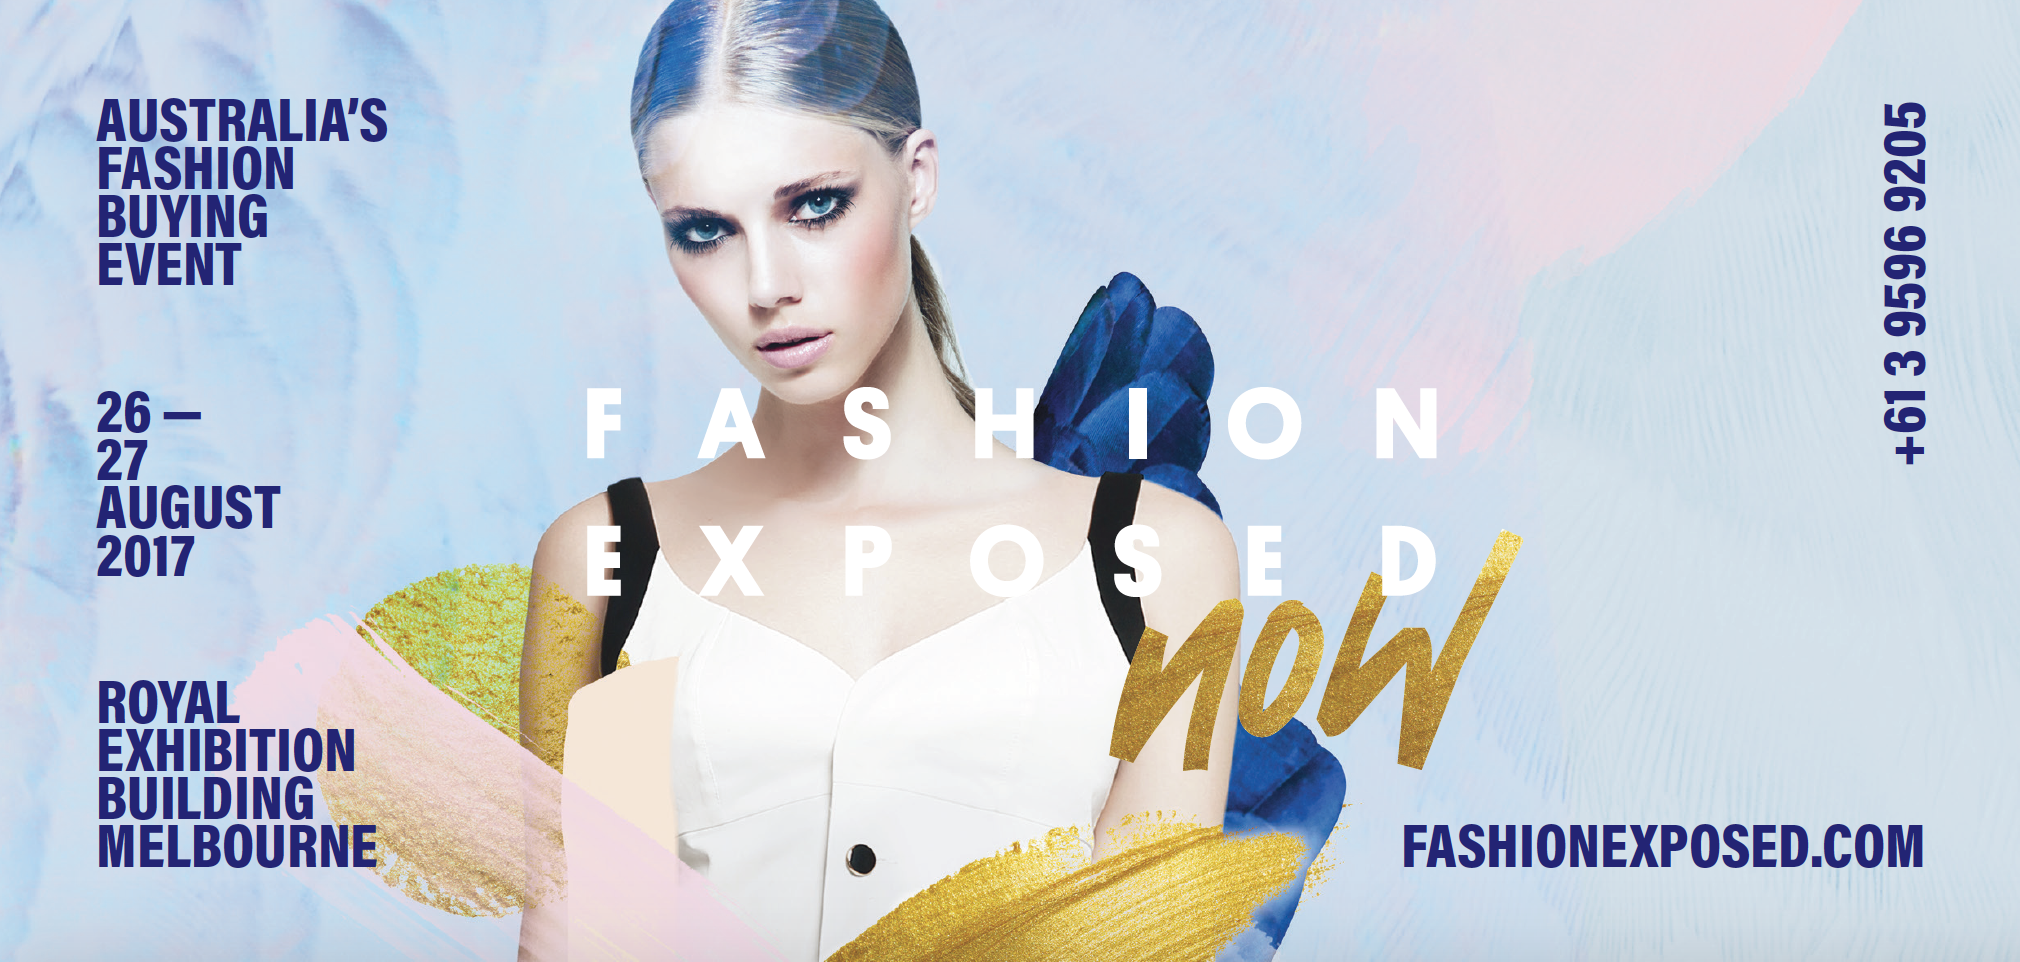 http://www.fashionexposed.com/